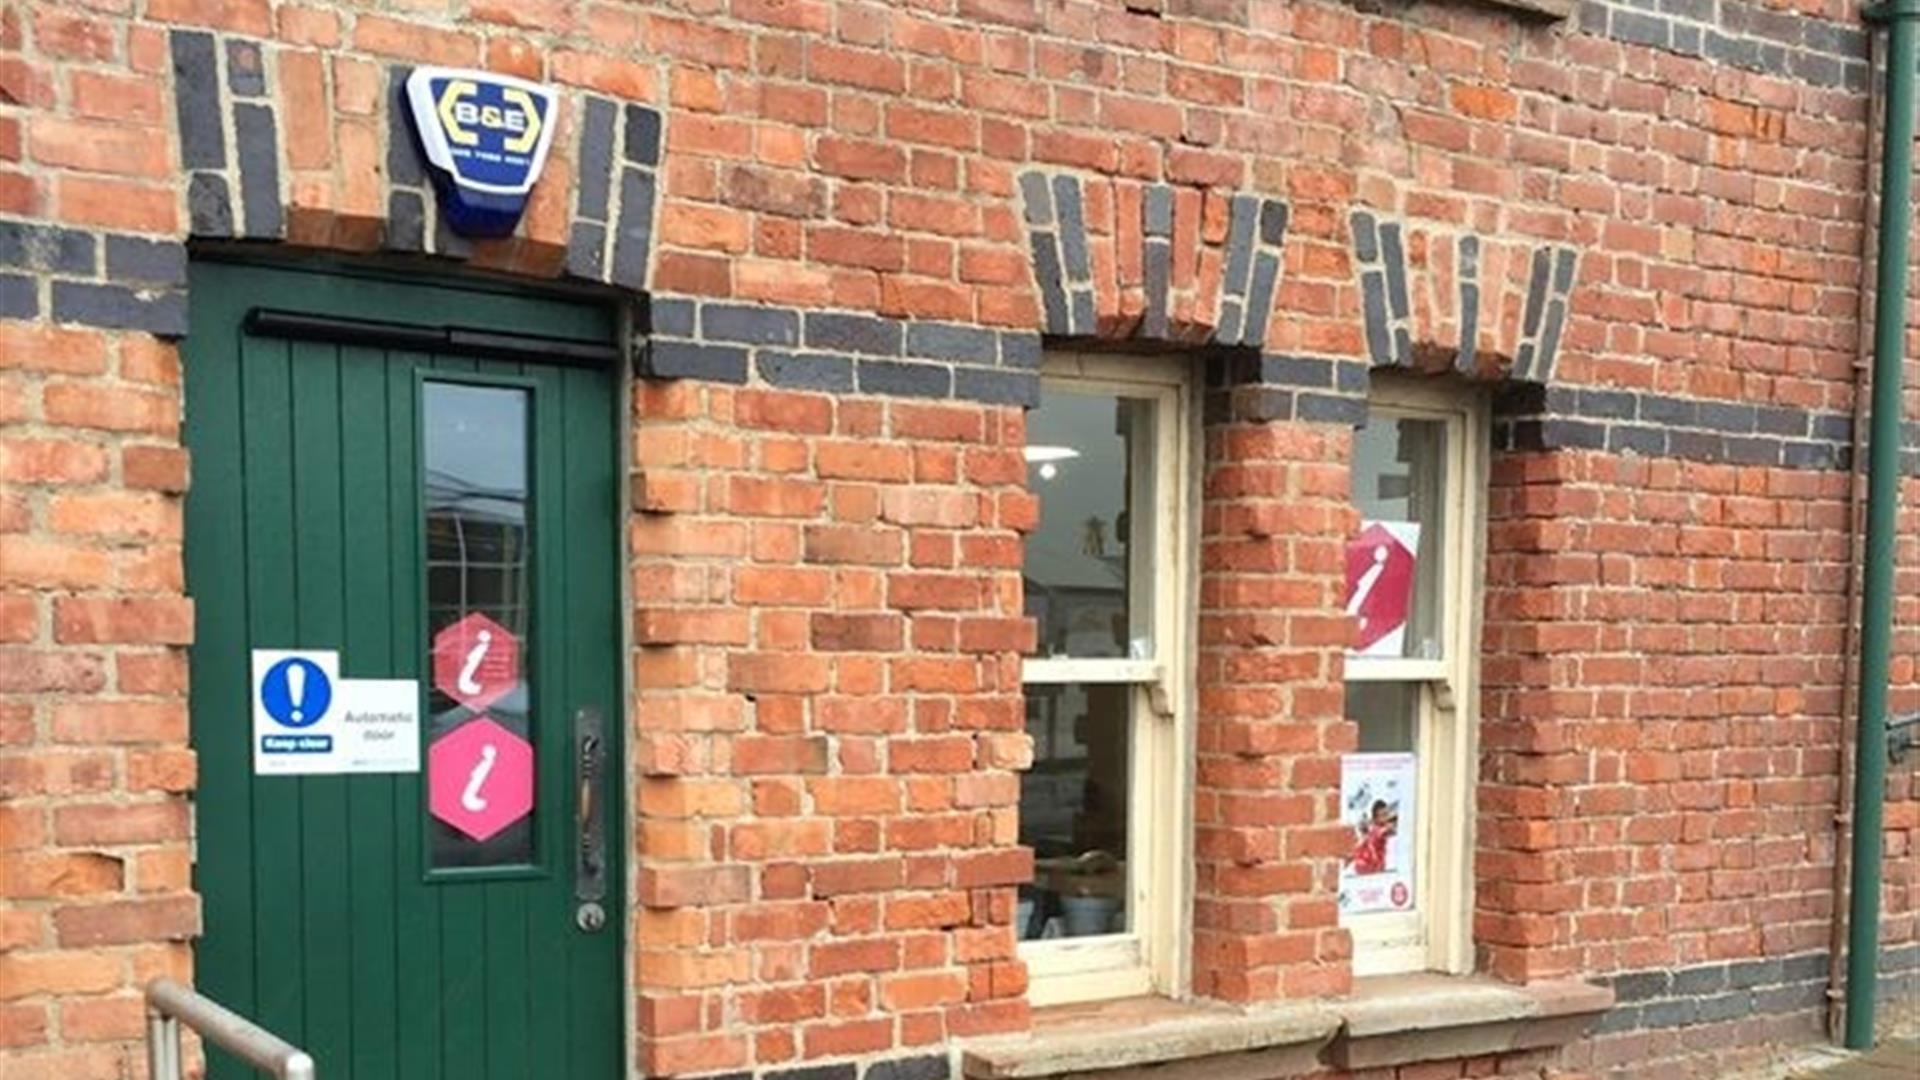 Portrush Visitor Information Centre